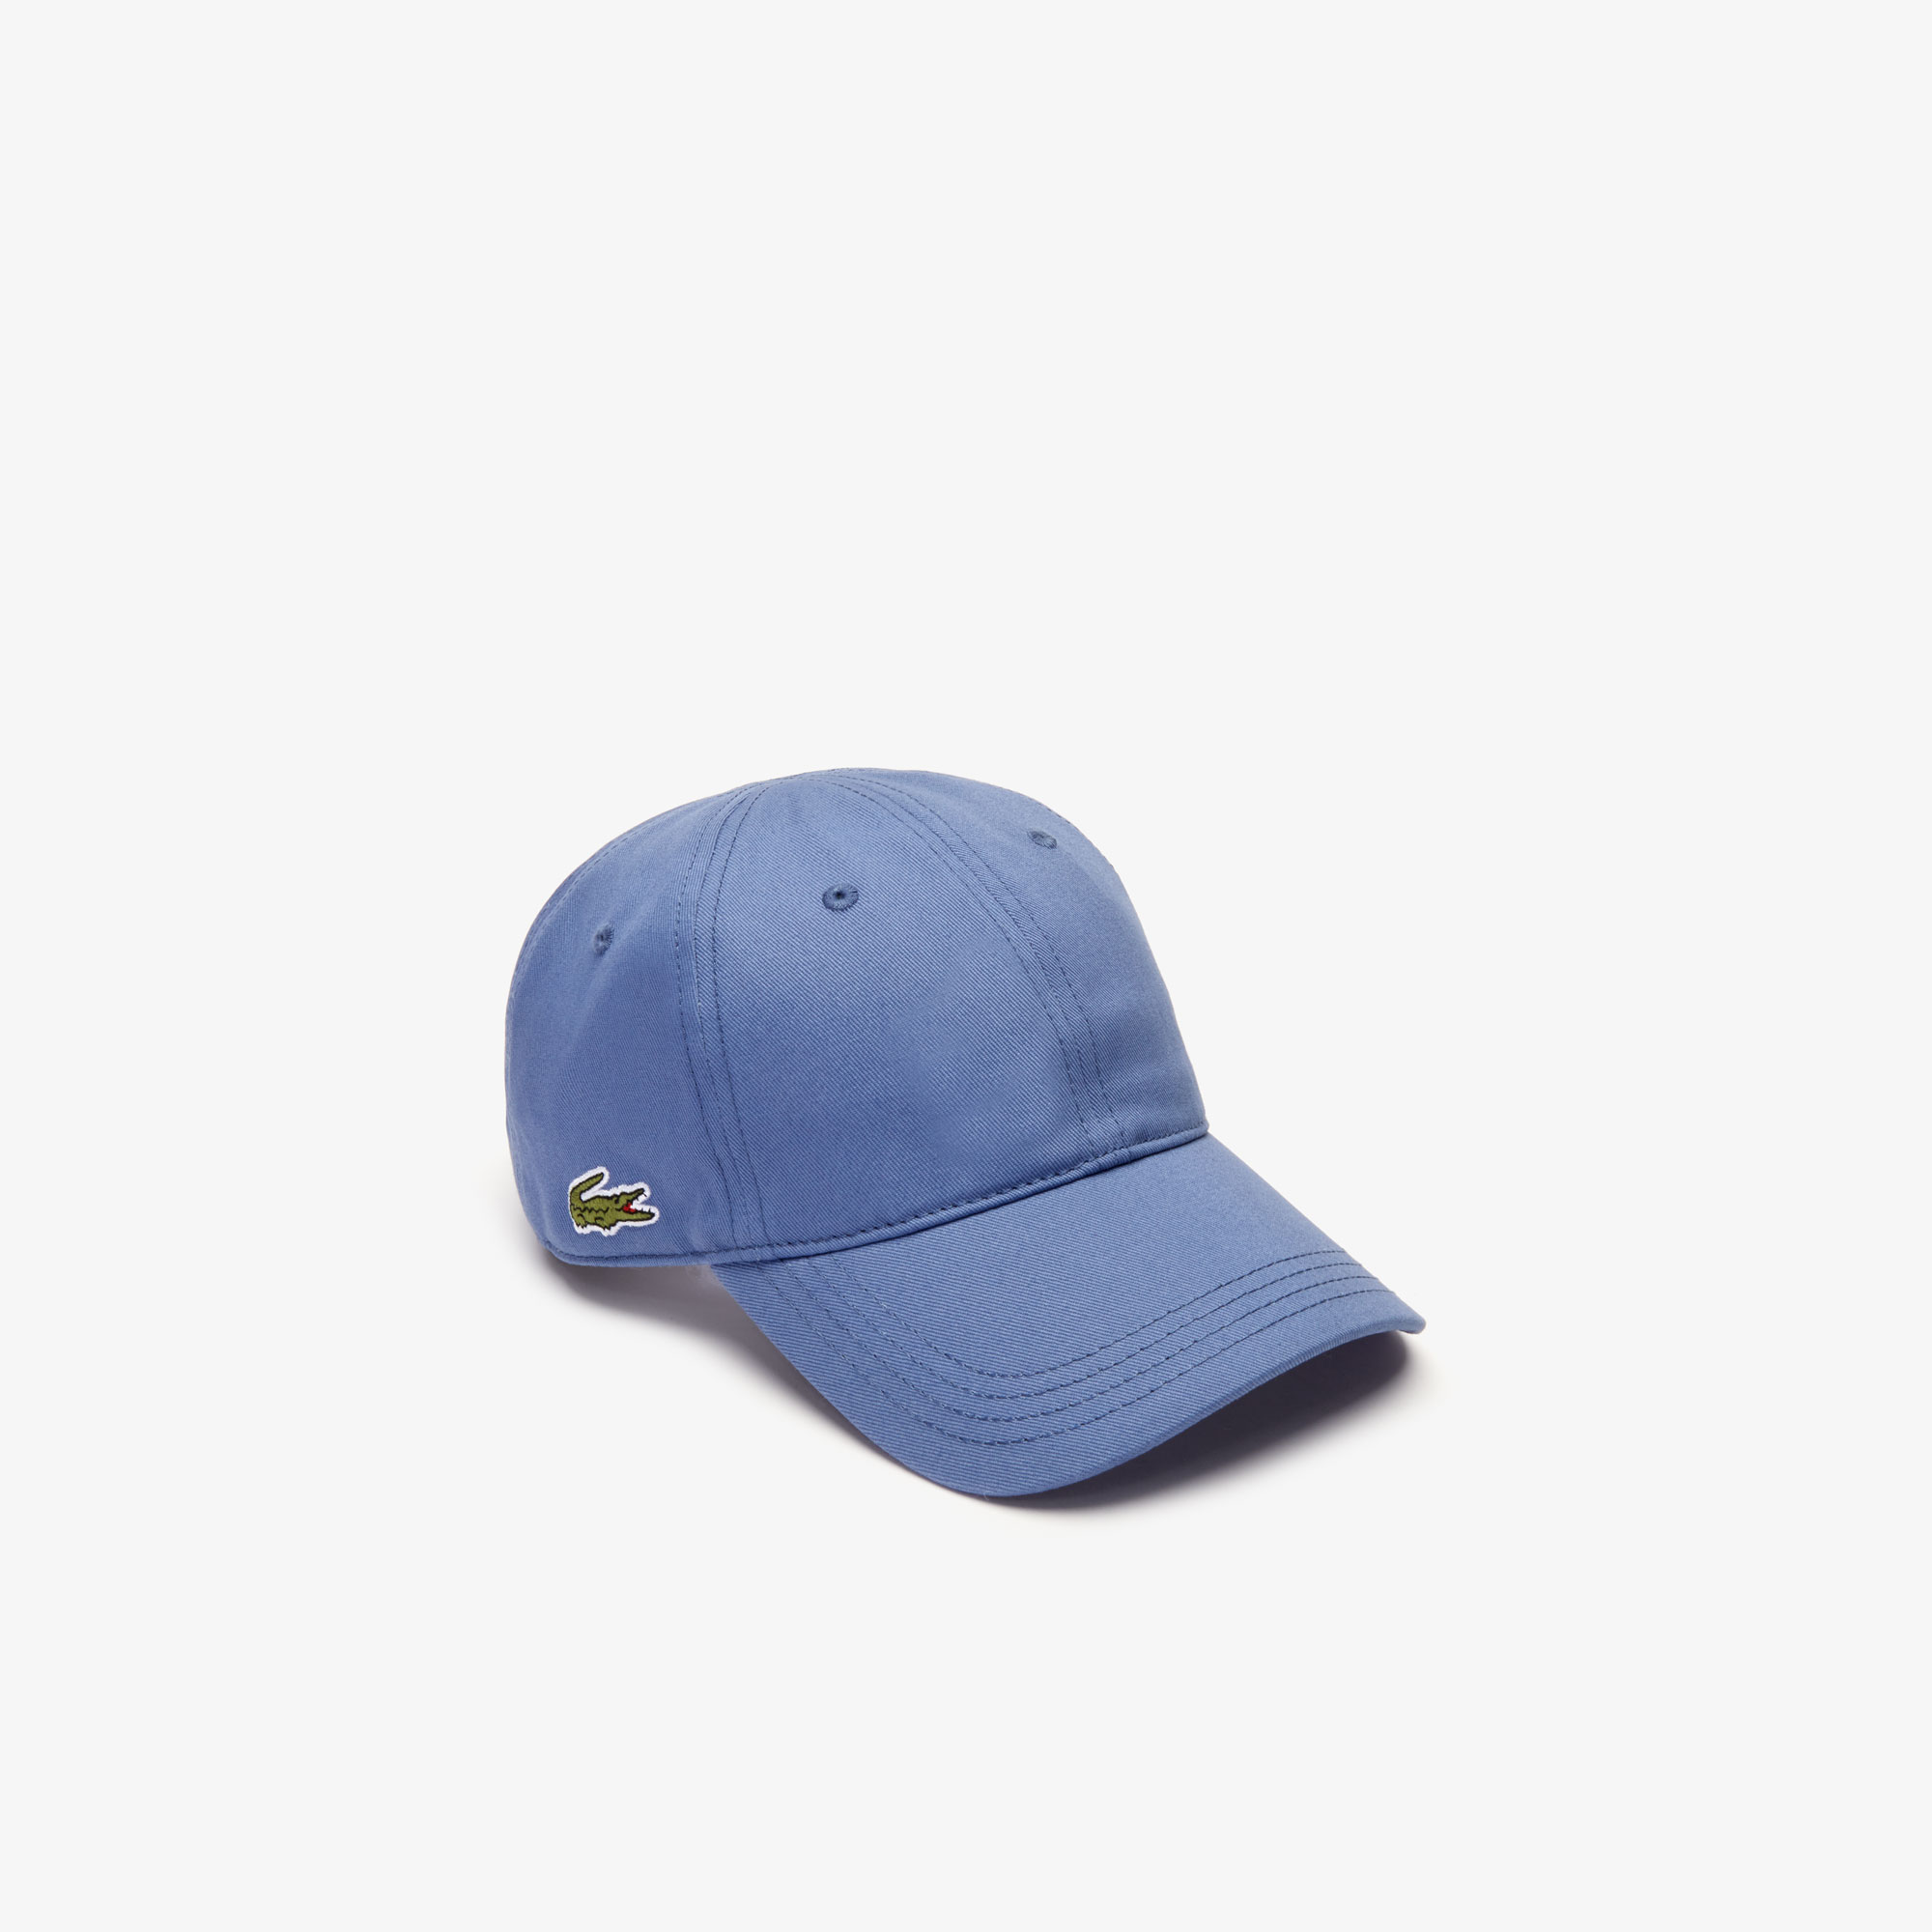 31a5ee31 Caps & Hats | Men's Accessories | LACOSTE